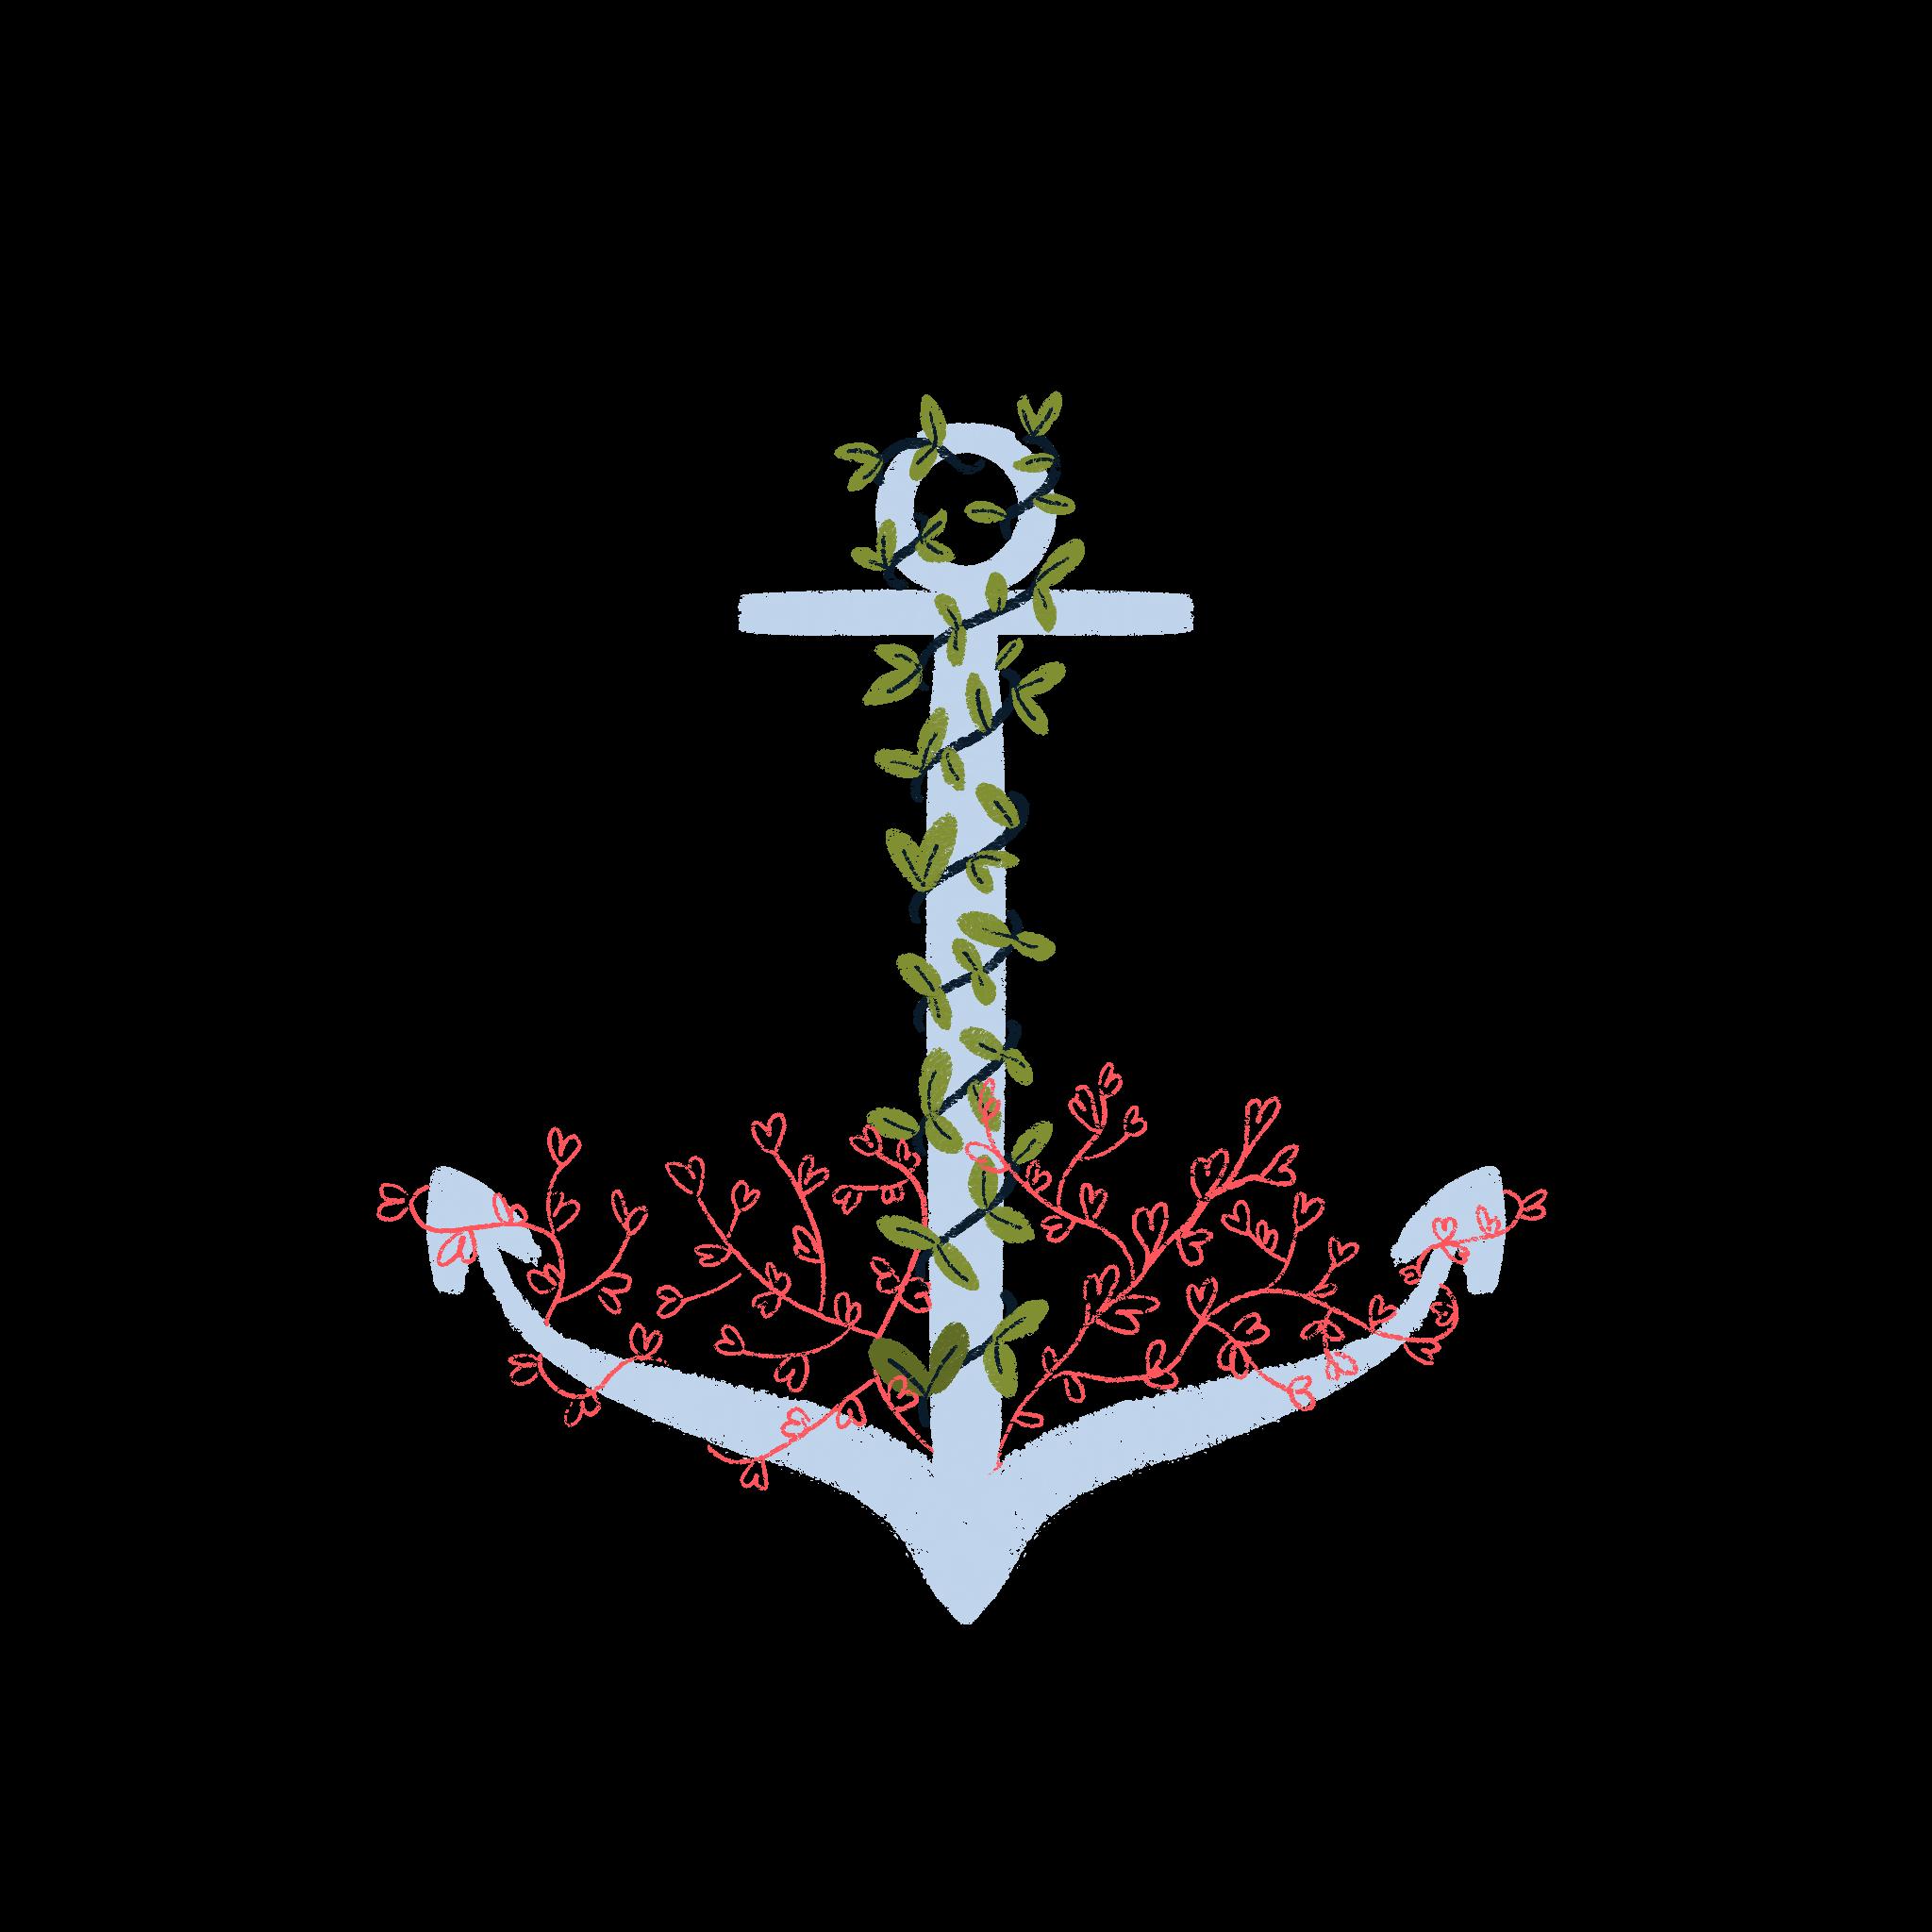 Anchor illustration